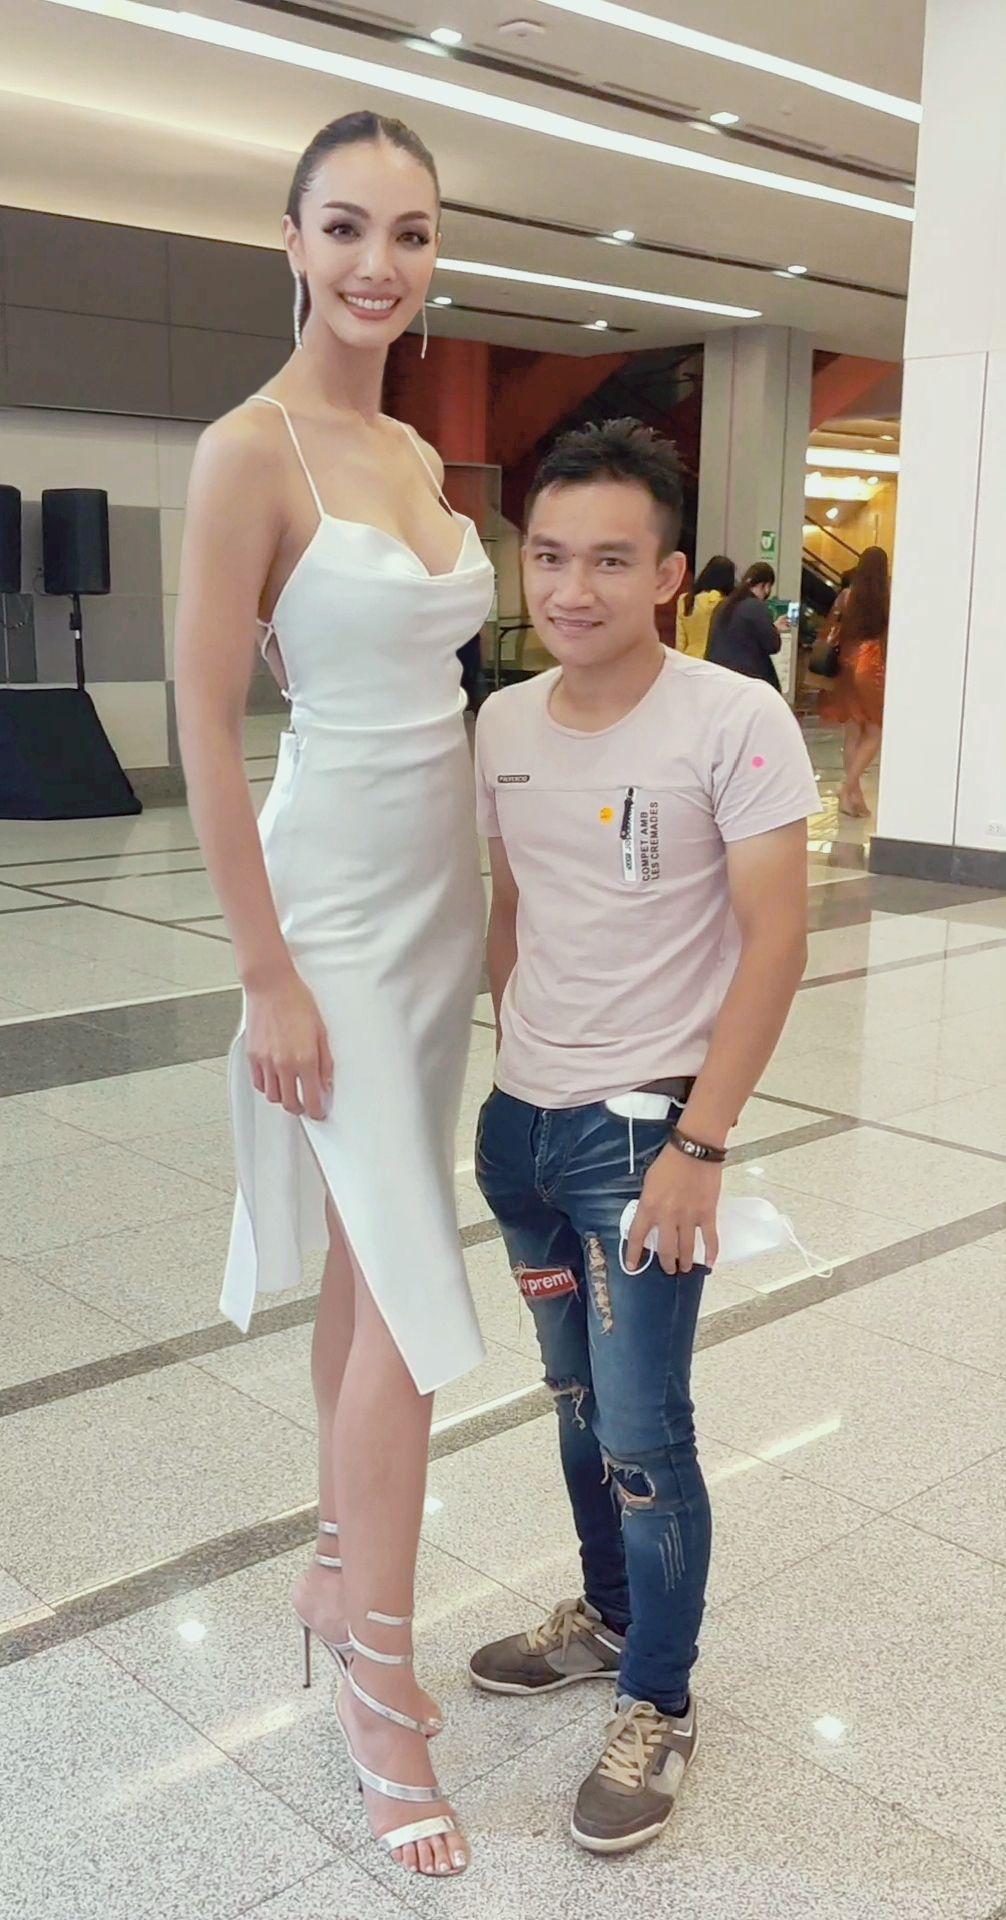 Pin by Tomer Paz on Tall girl | Tall women, Tall girl